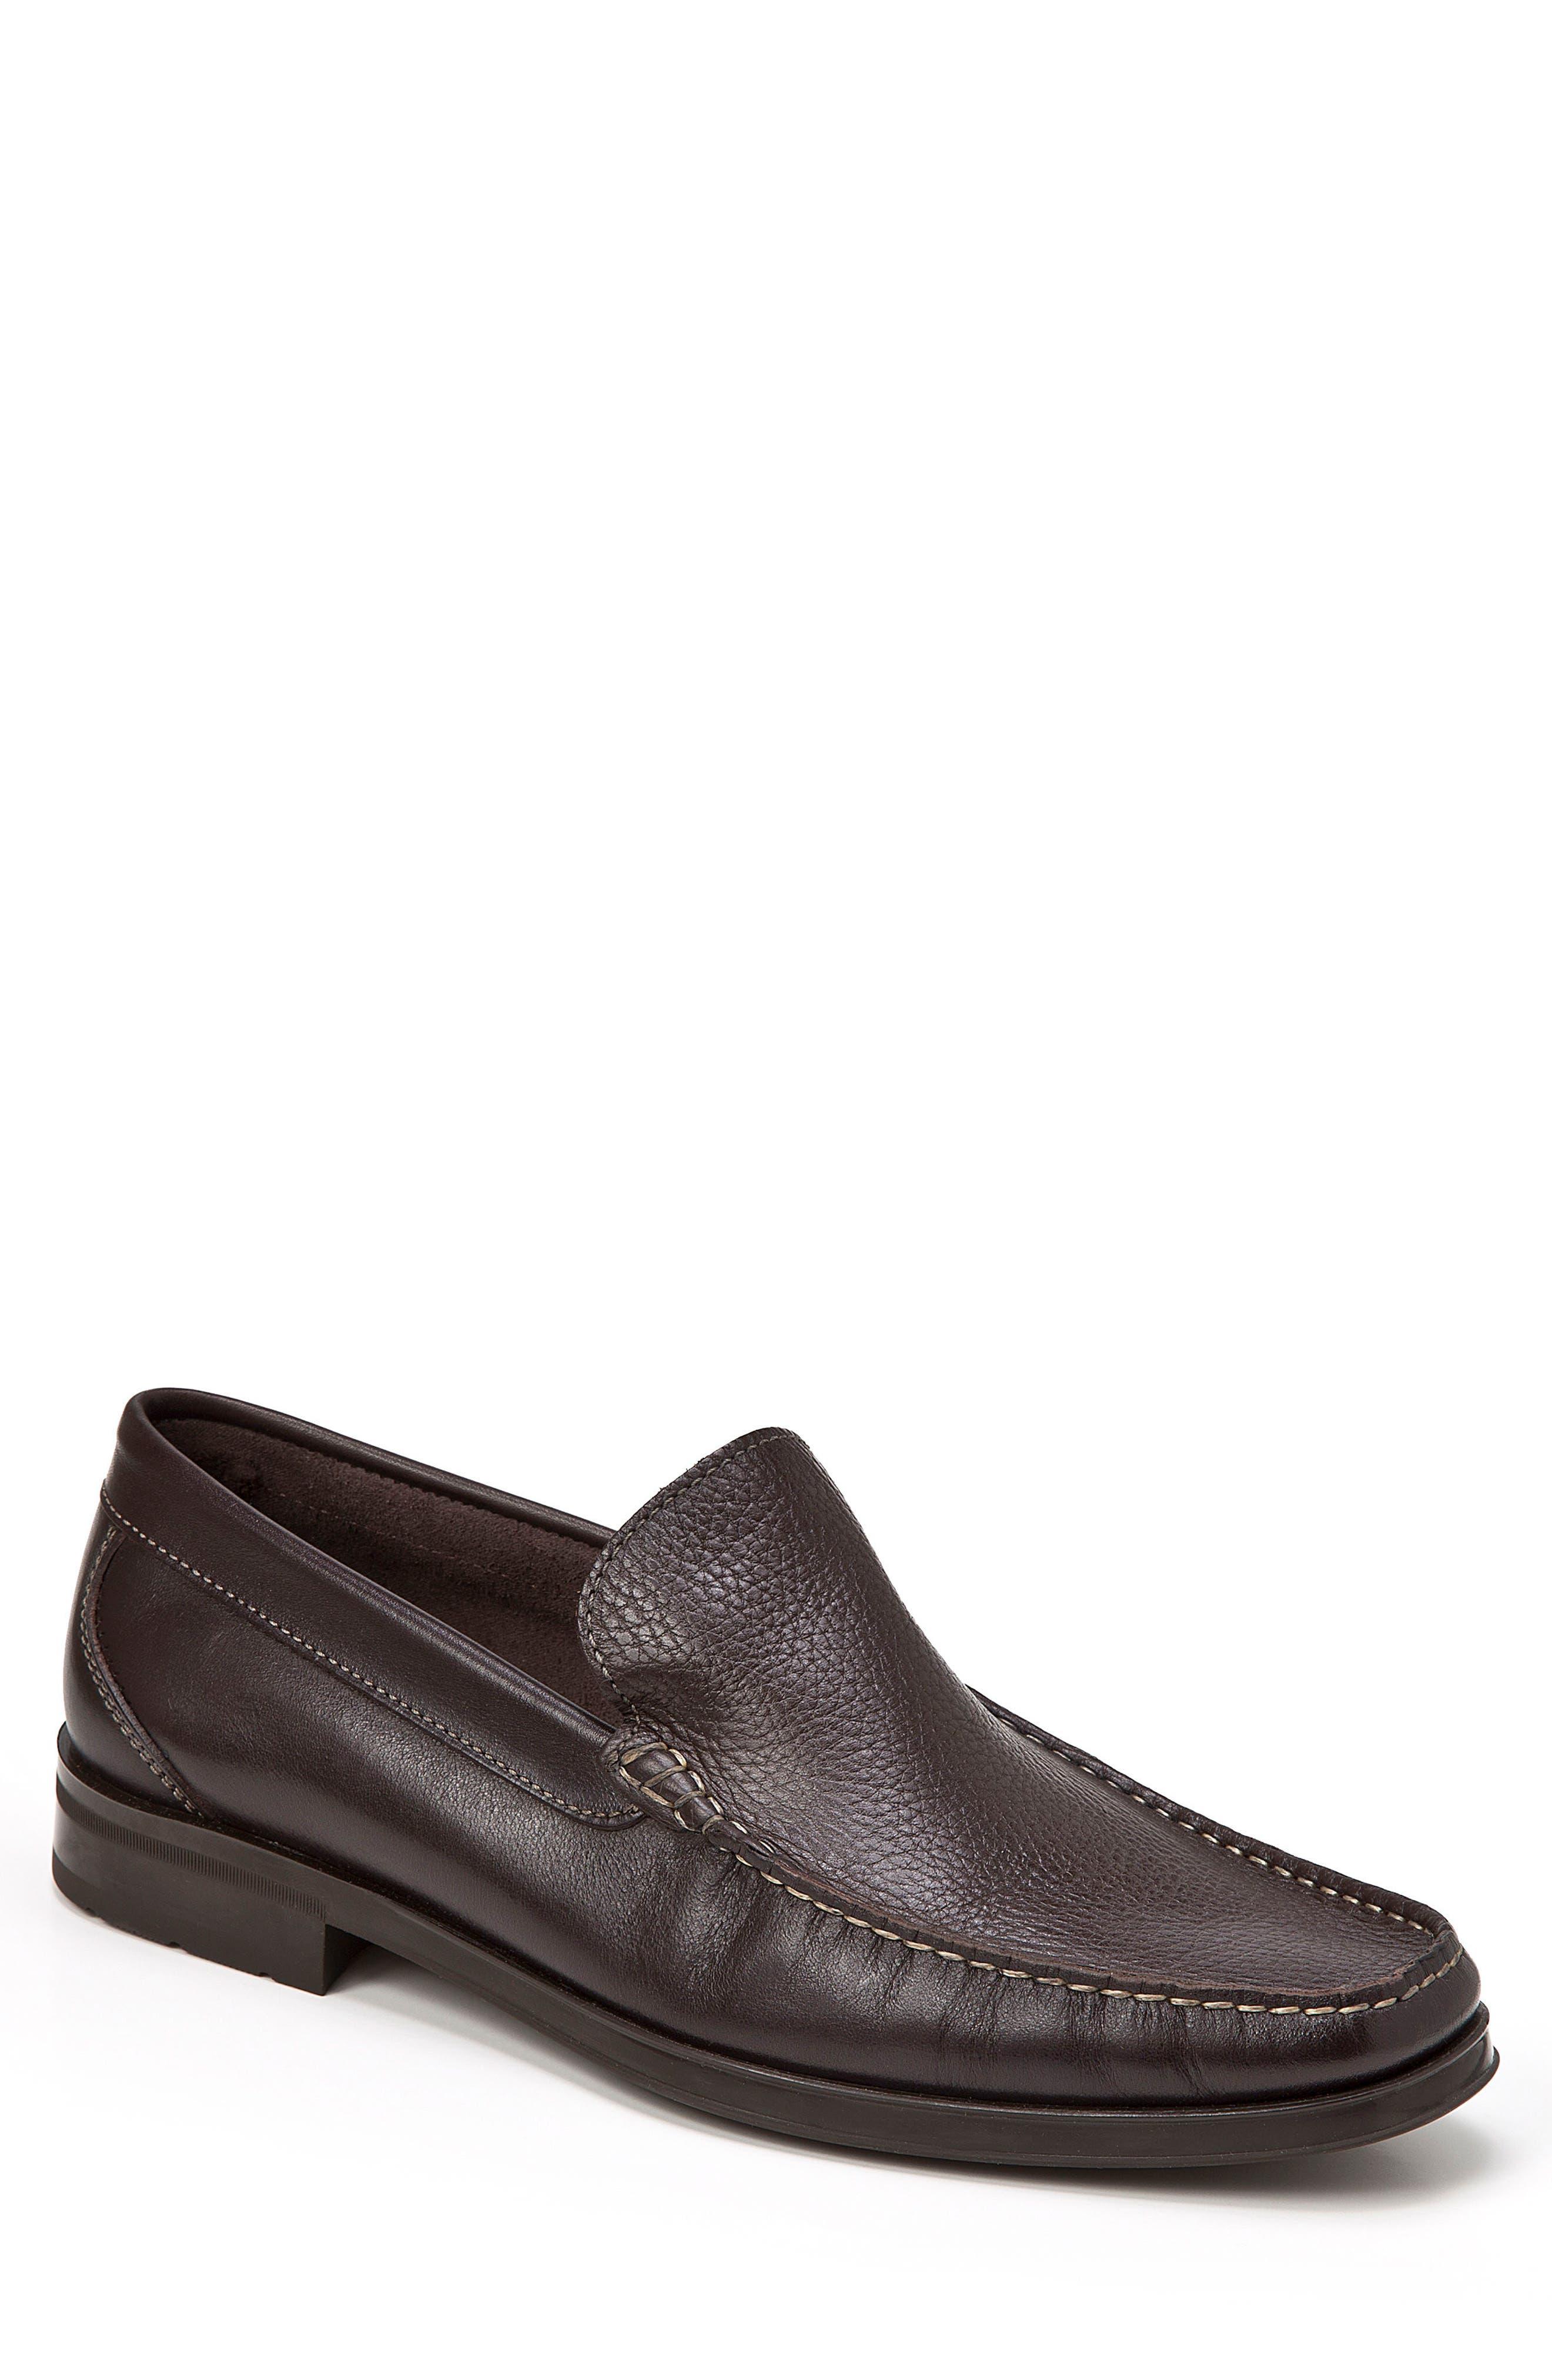 Euardo Moc Toe Loafer,                         Main,                         color, Brown